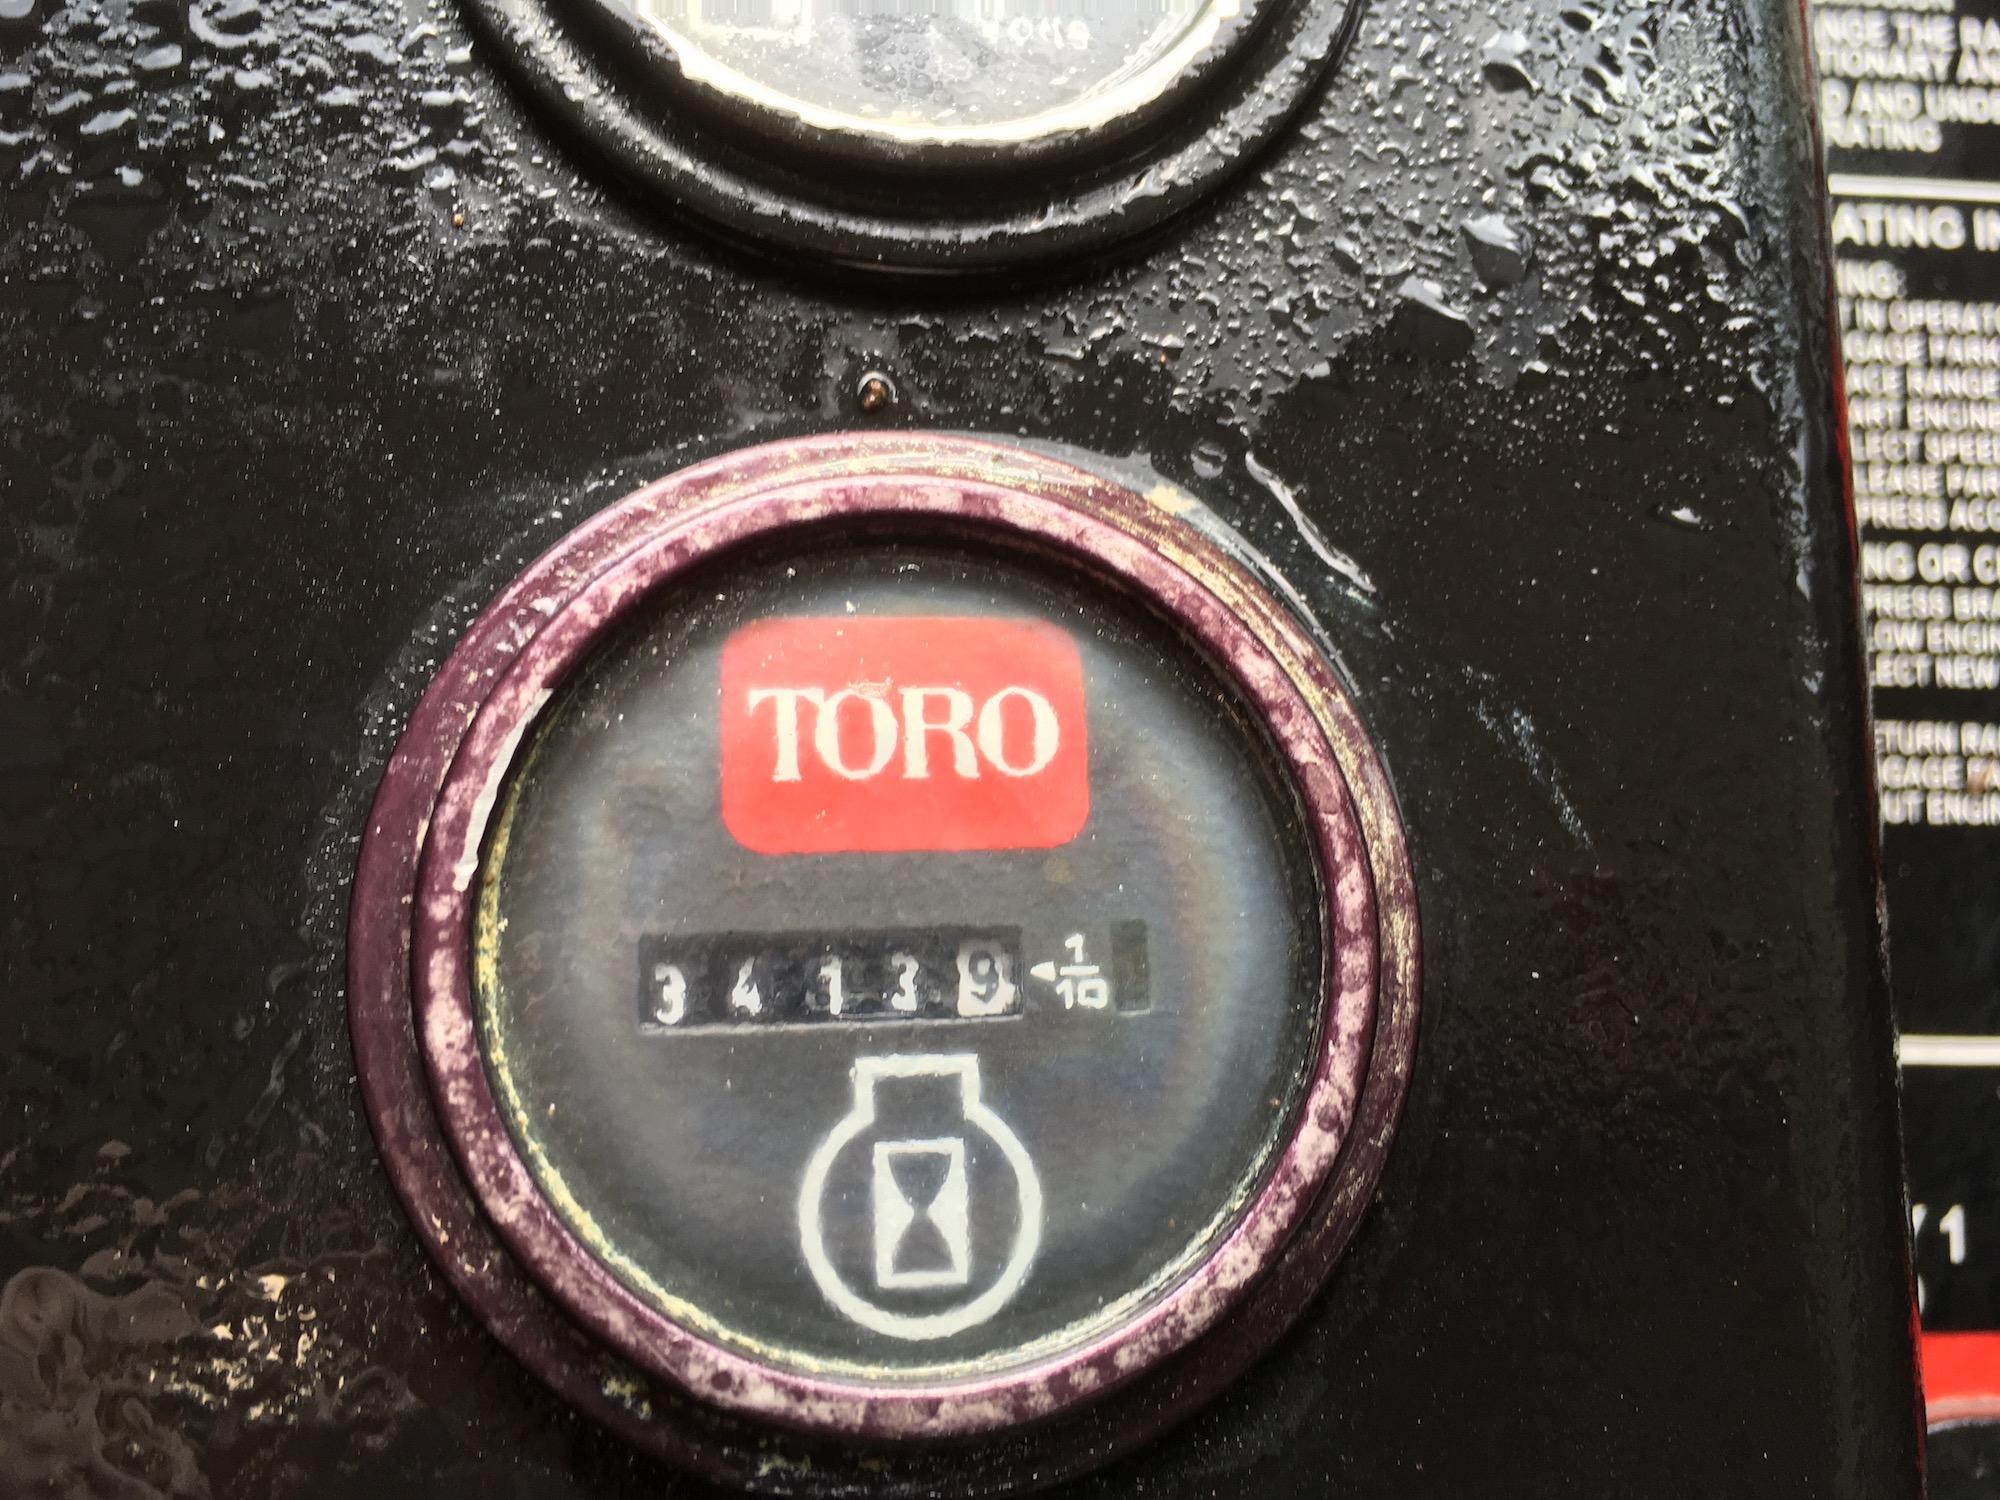 Toro-1250-MultiPro-Sprayer-07